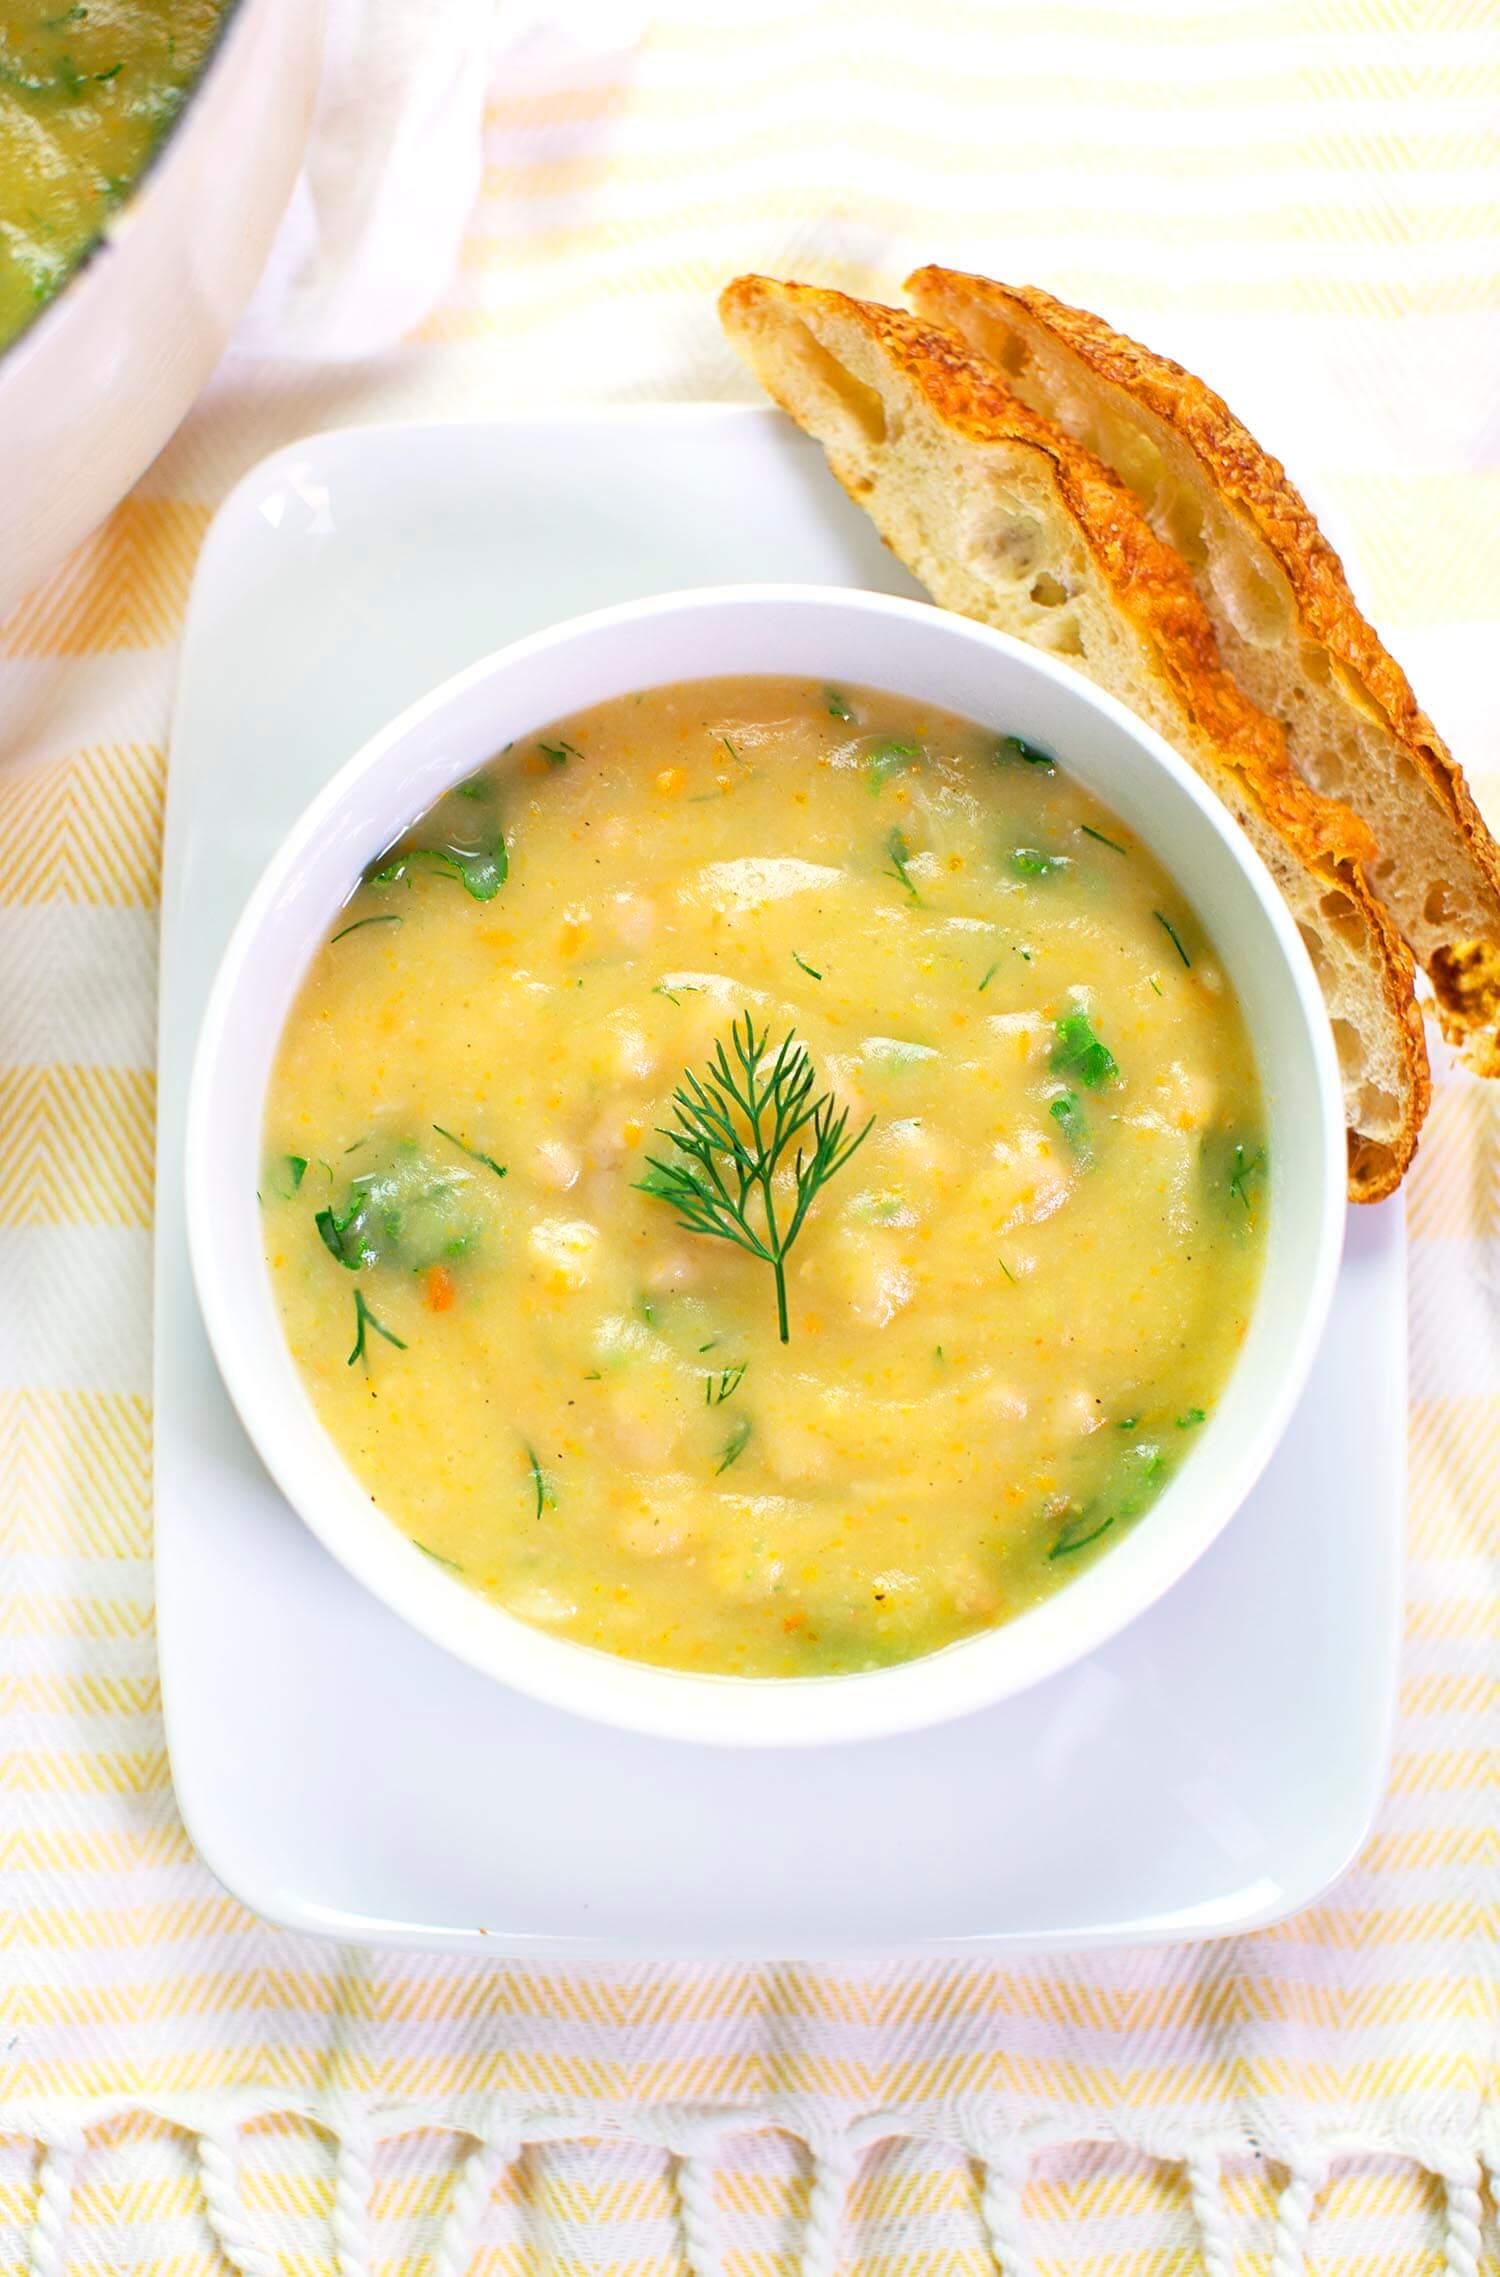 Creamy vegan soup recipes